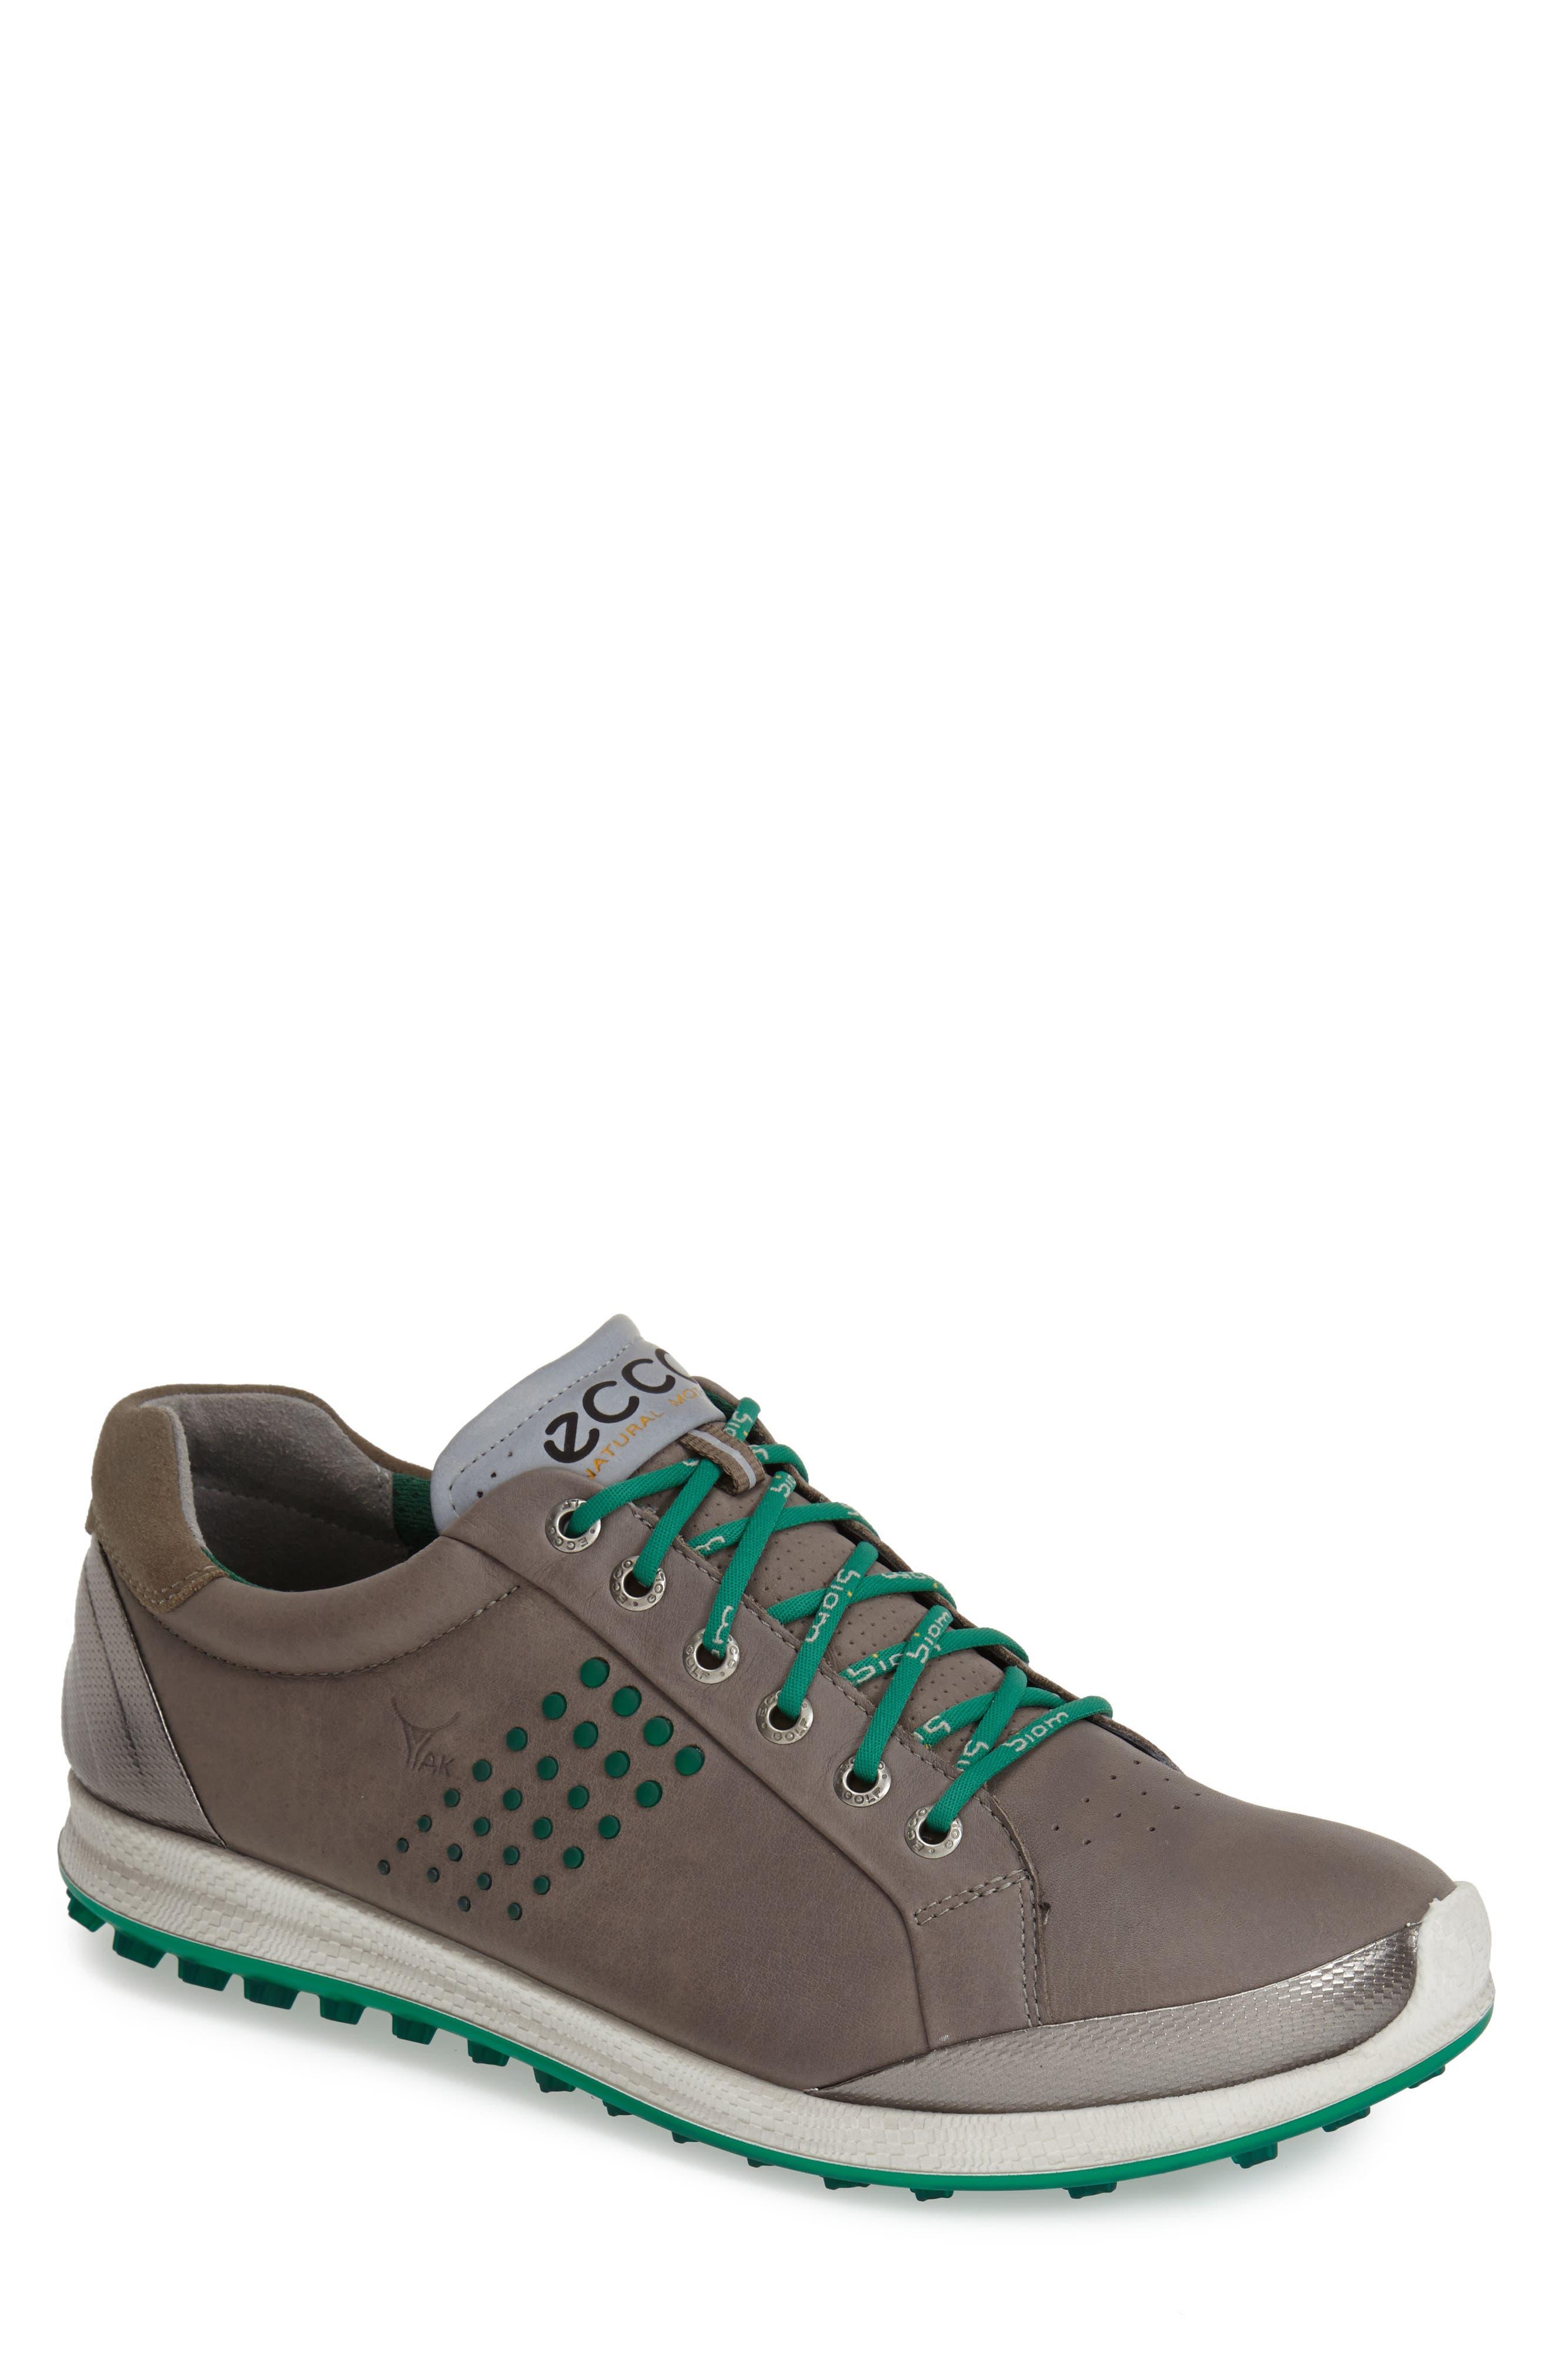 BIOM Hybrid 2 Golf Shoe,                             Alternate thumbnail 4, color,                             WARM GREY/ GREEN